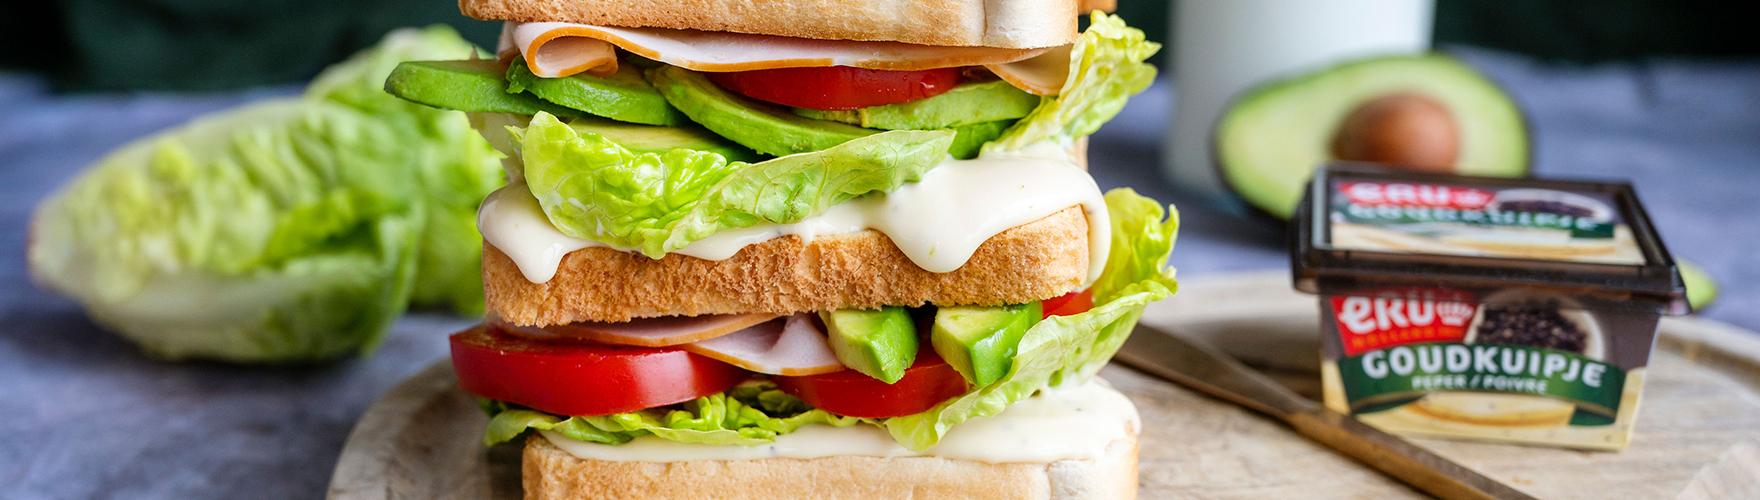 Clubsandwich met avocado, kip, tomaat en sla